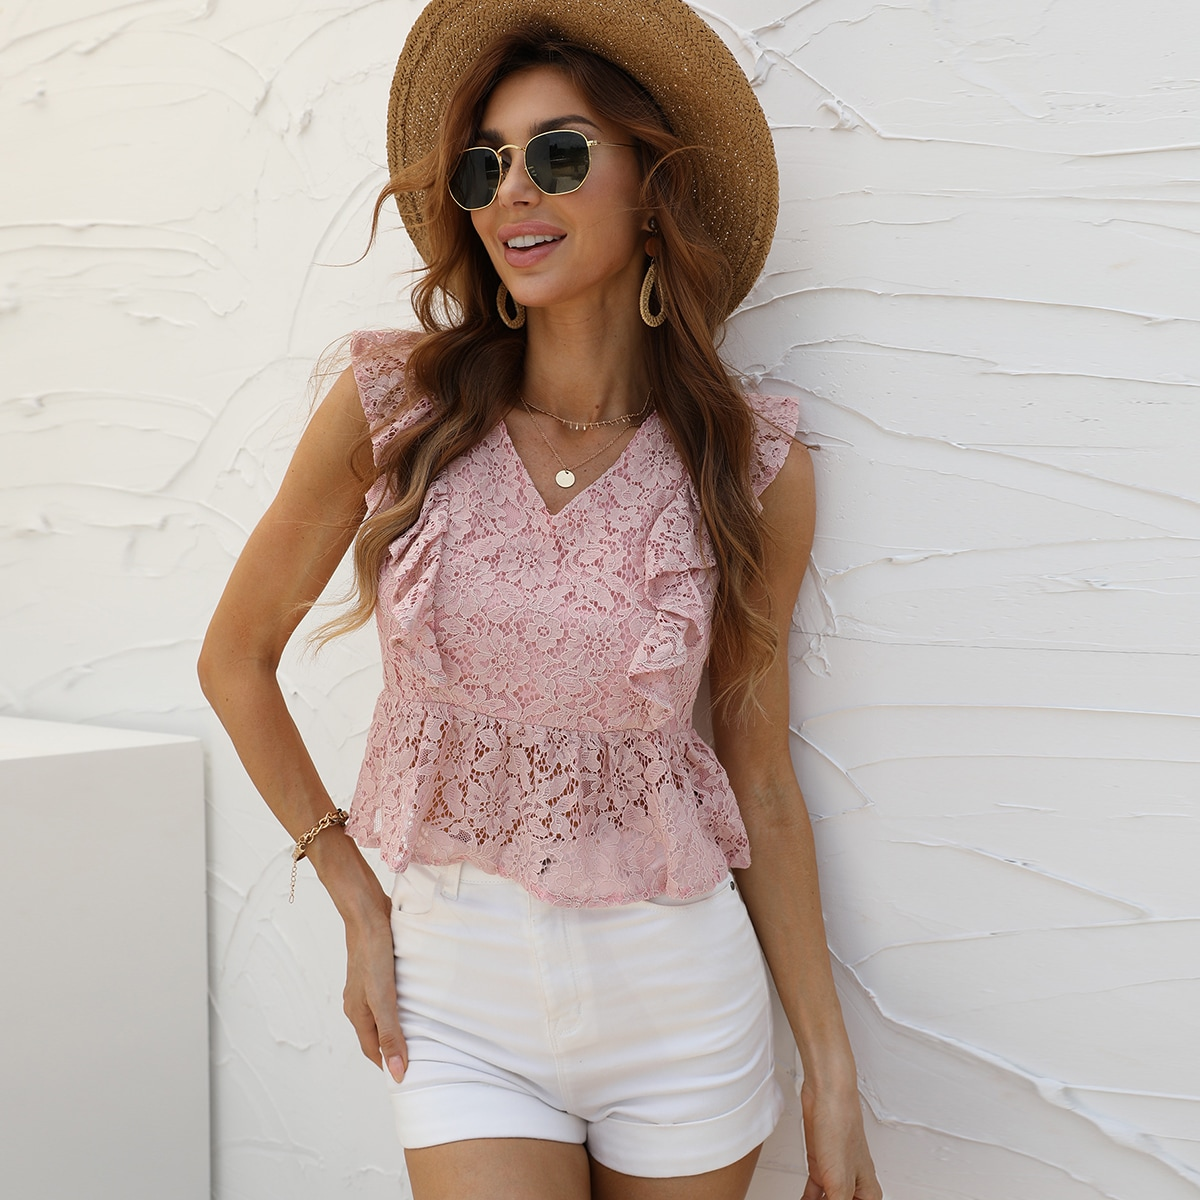 Блуза с оборкой кружевом SheIn swblouse23210407504